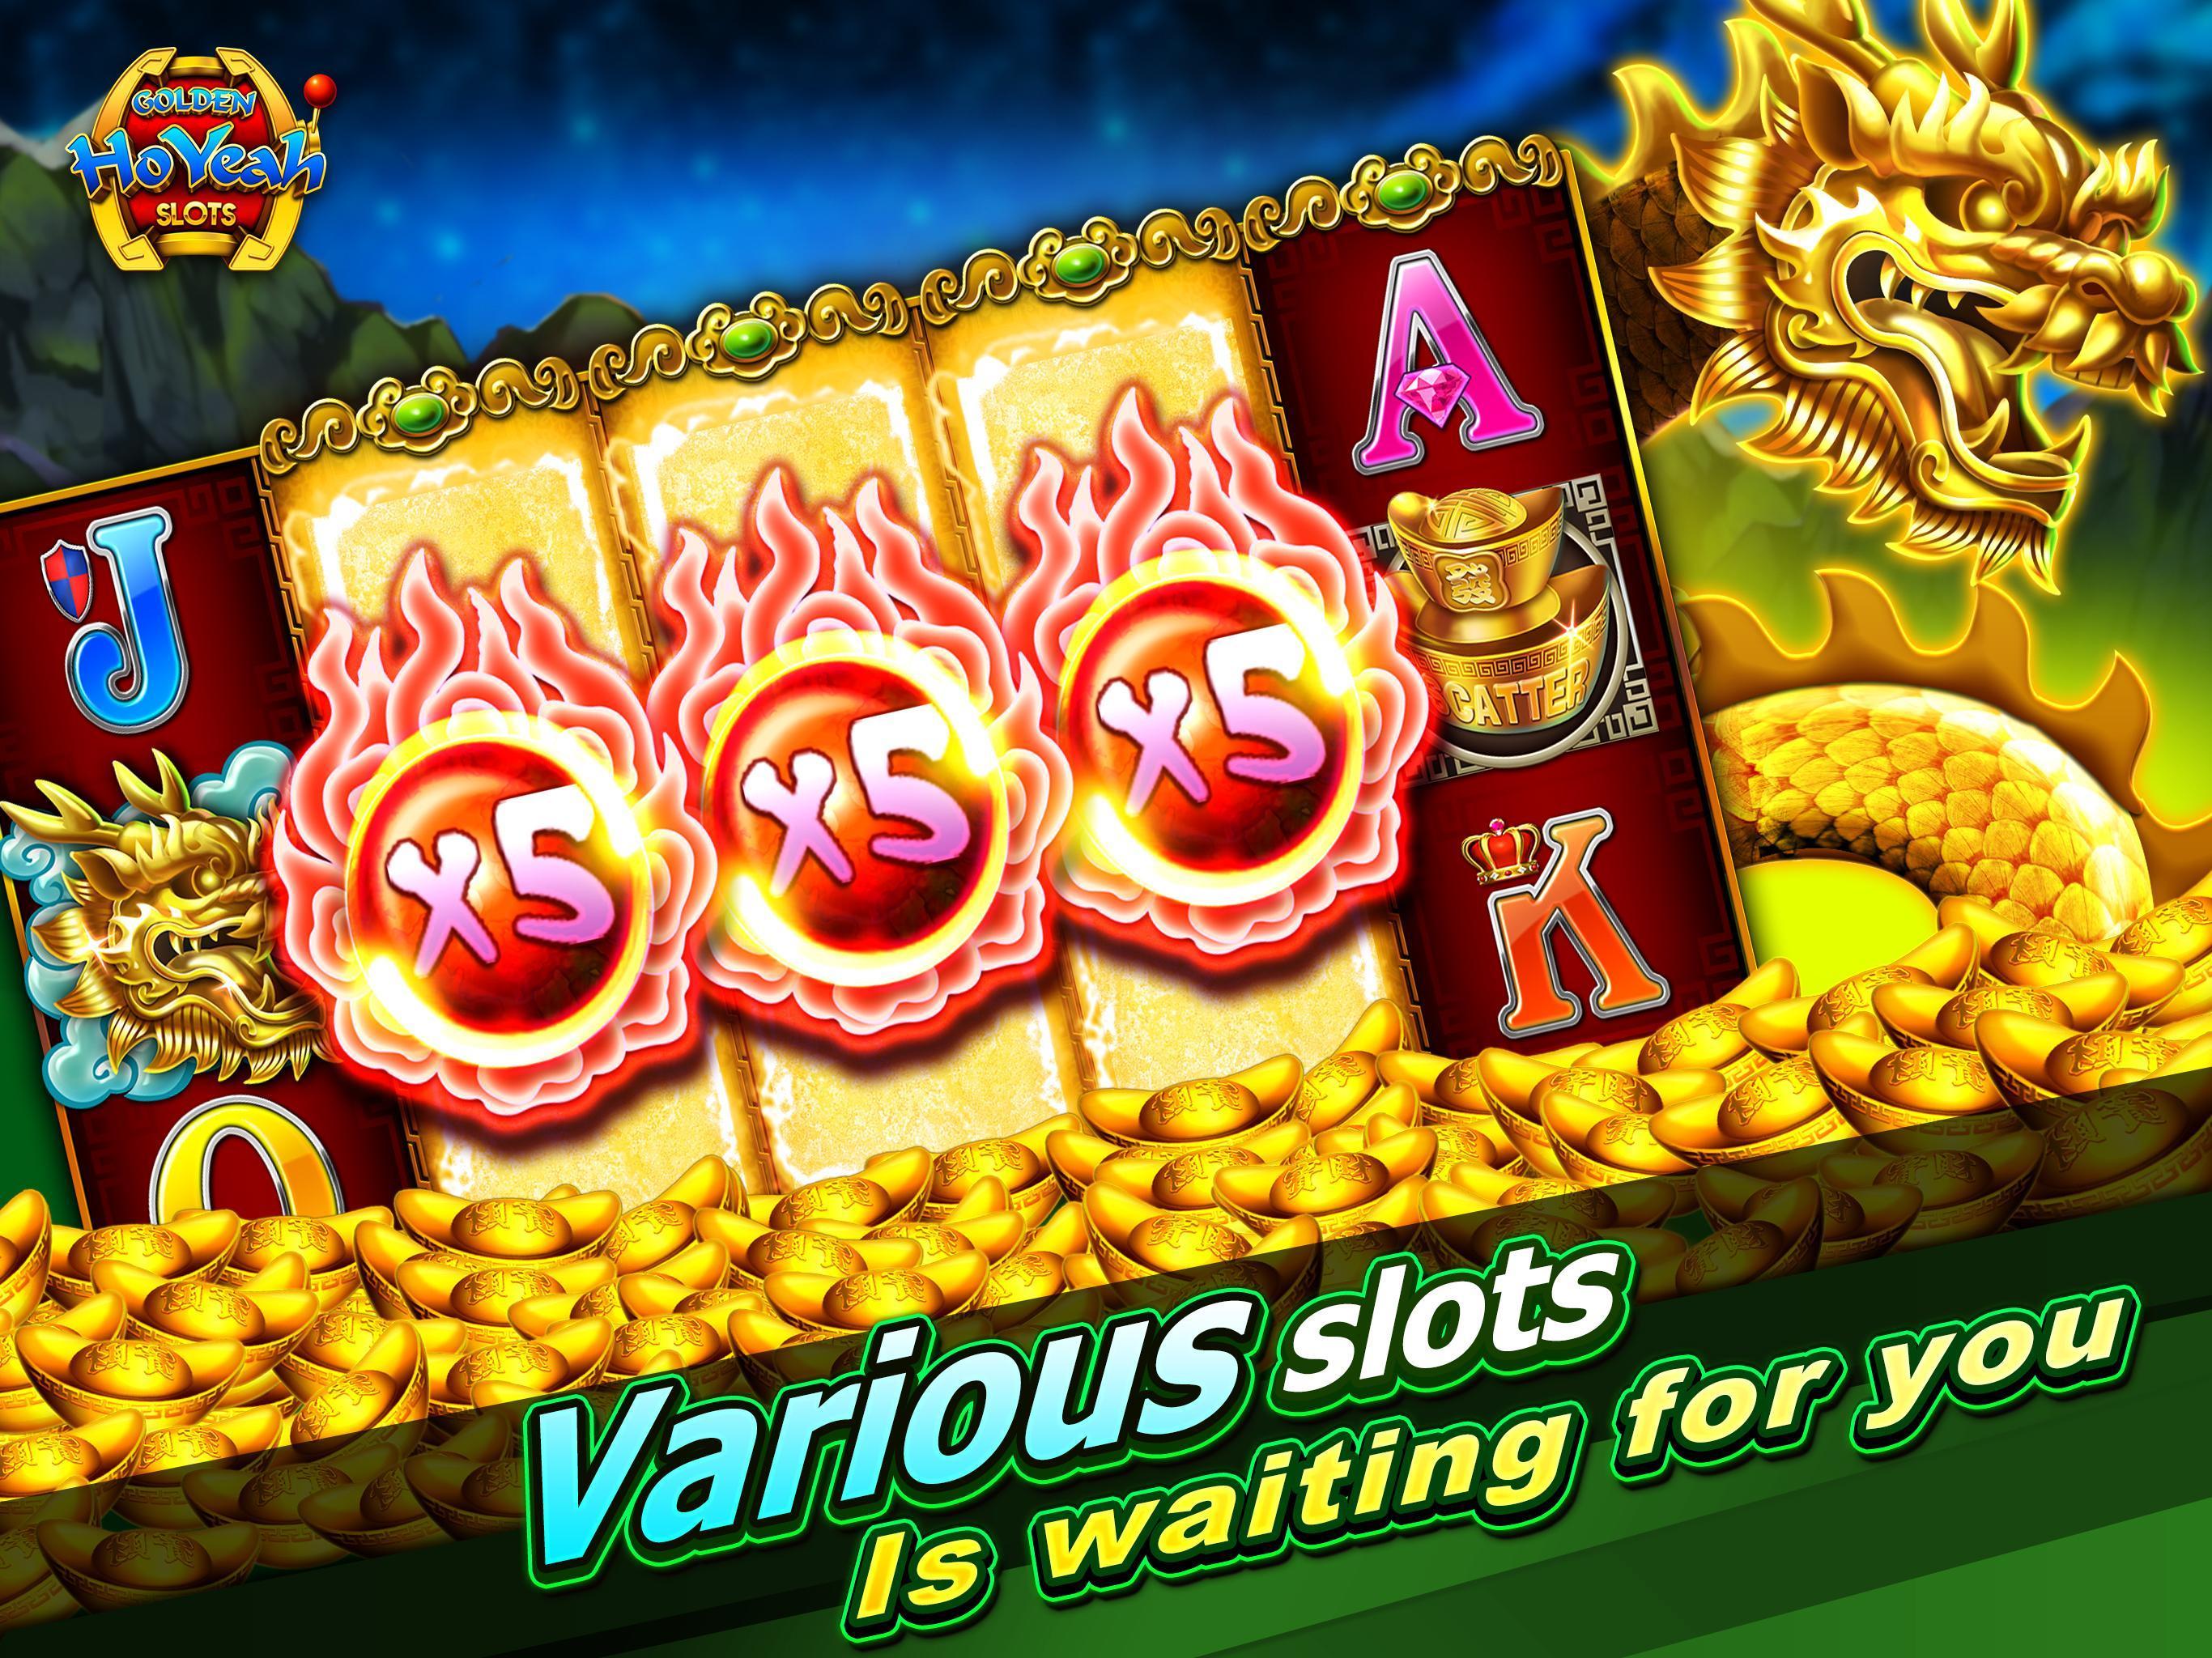 Slots (Golden HoYeah) - Casino Slots 2.5.7 Screenshot 18